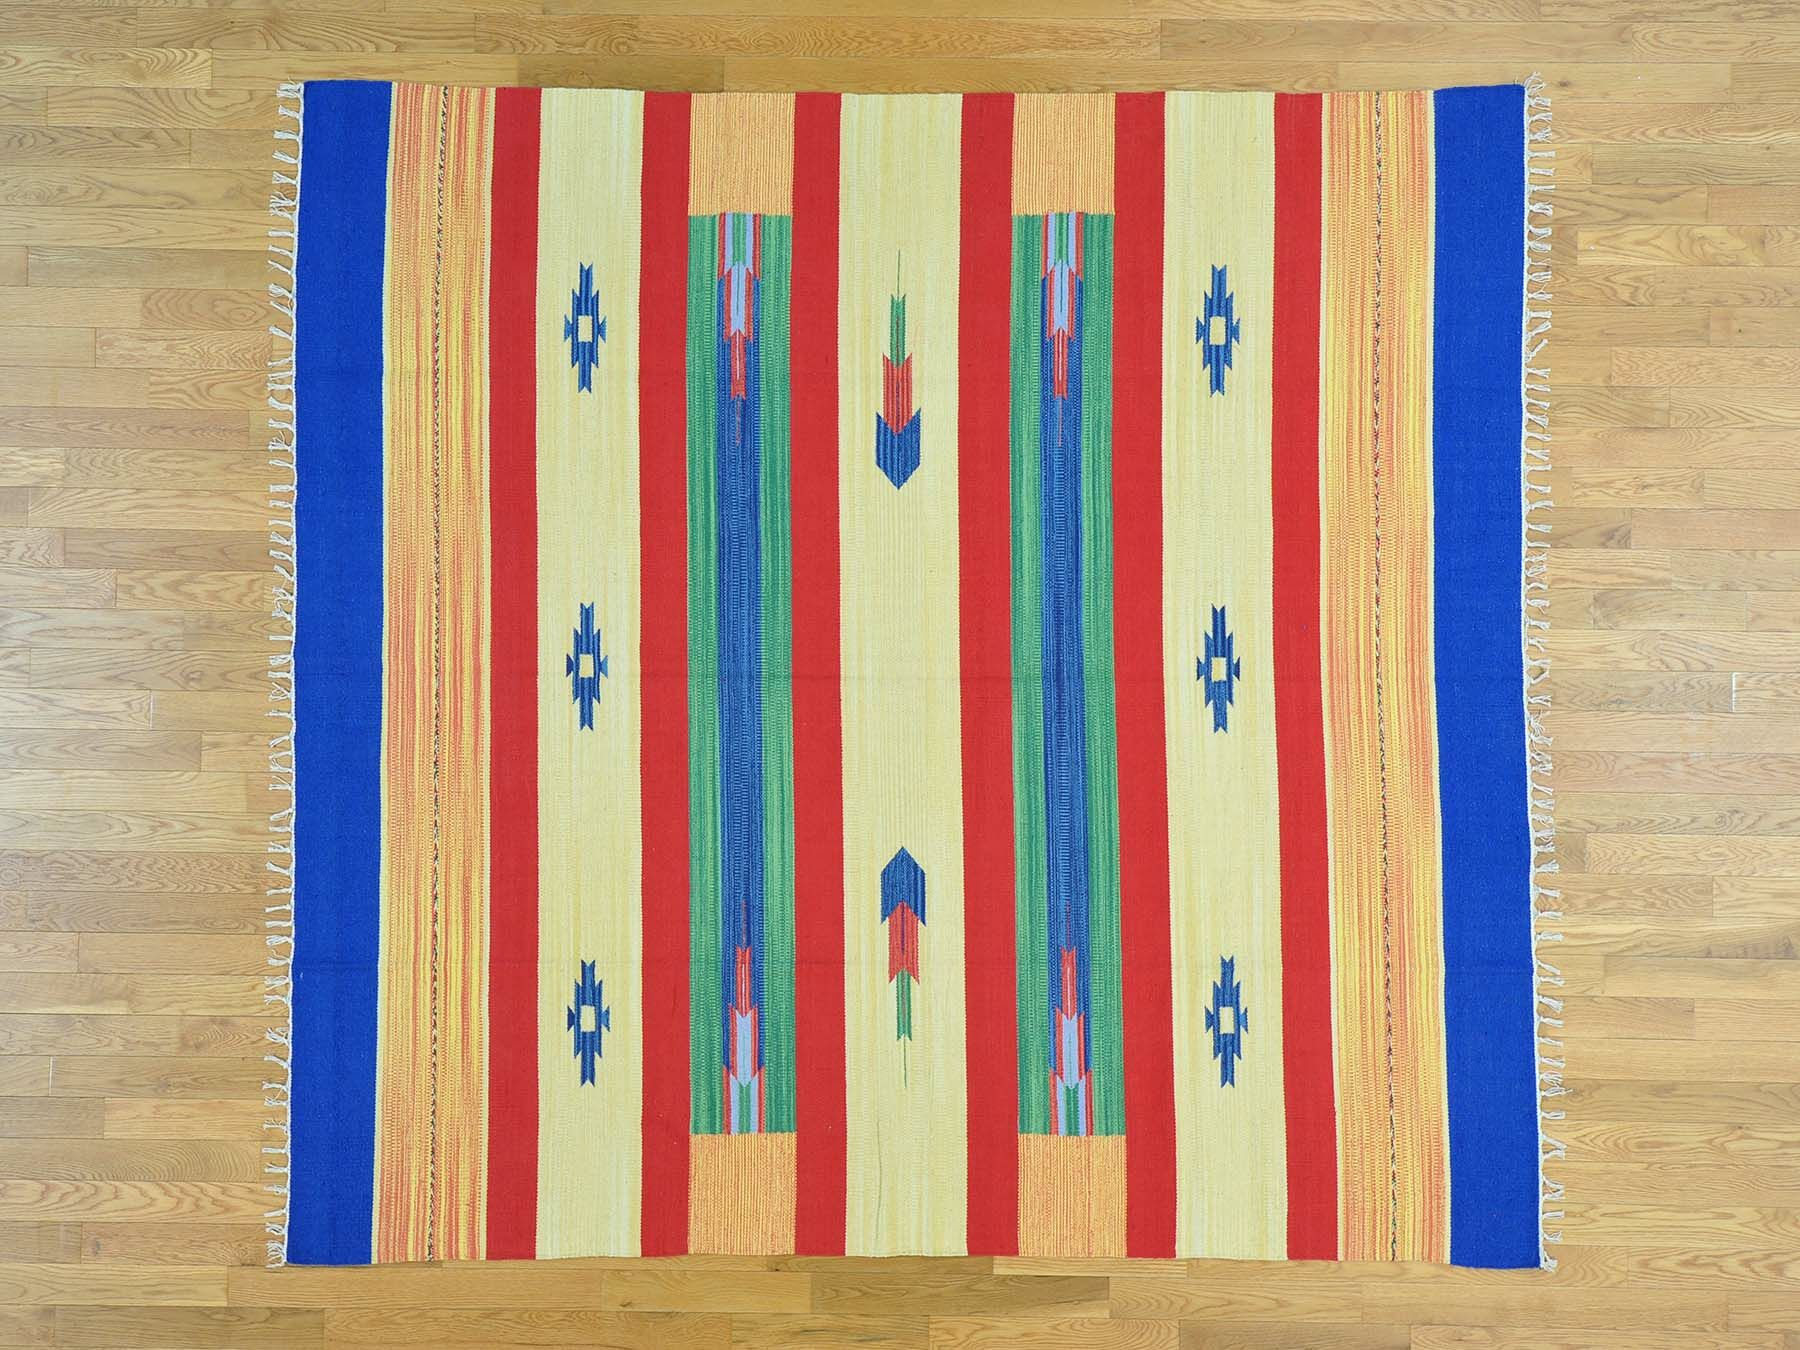 One-of-a-Kind Big Coppitt Key Squarish Southwestern Design Killim Handwoven Wool Area Rug